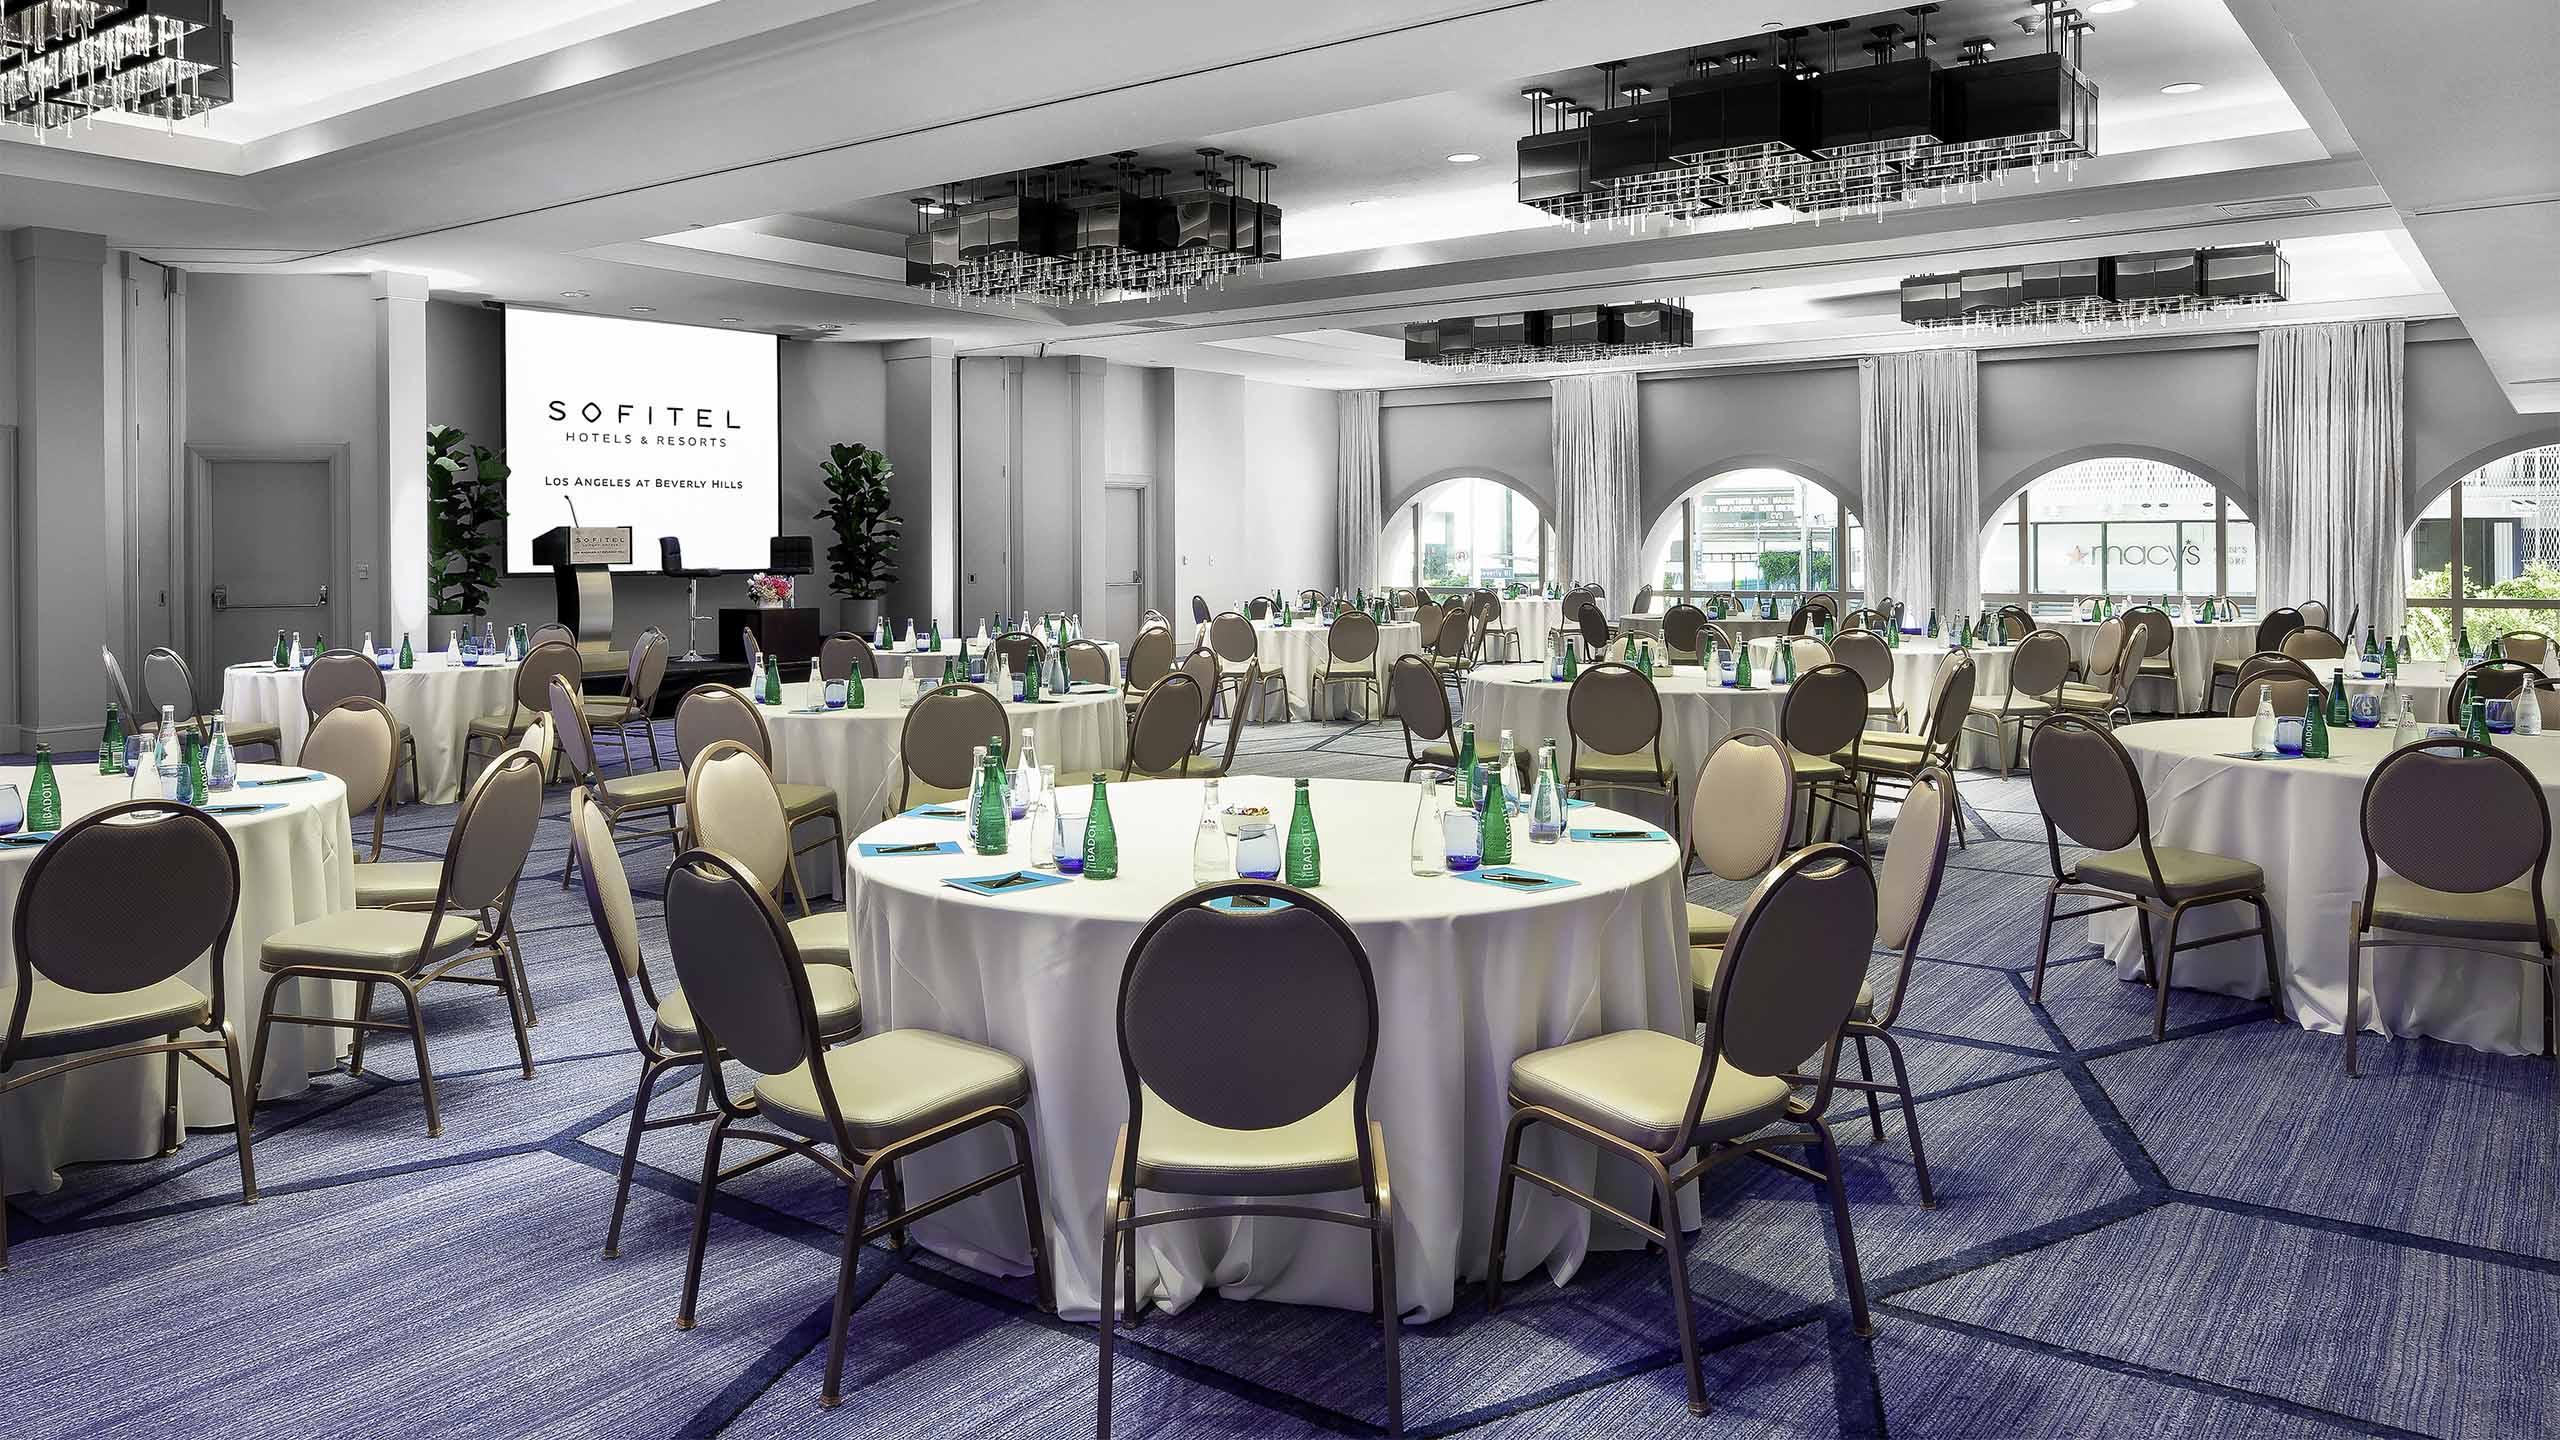 Luxury Hotel Los Angeles – Sofitel Los Angeles At Beverly Hills avec Salon De Jardin California